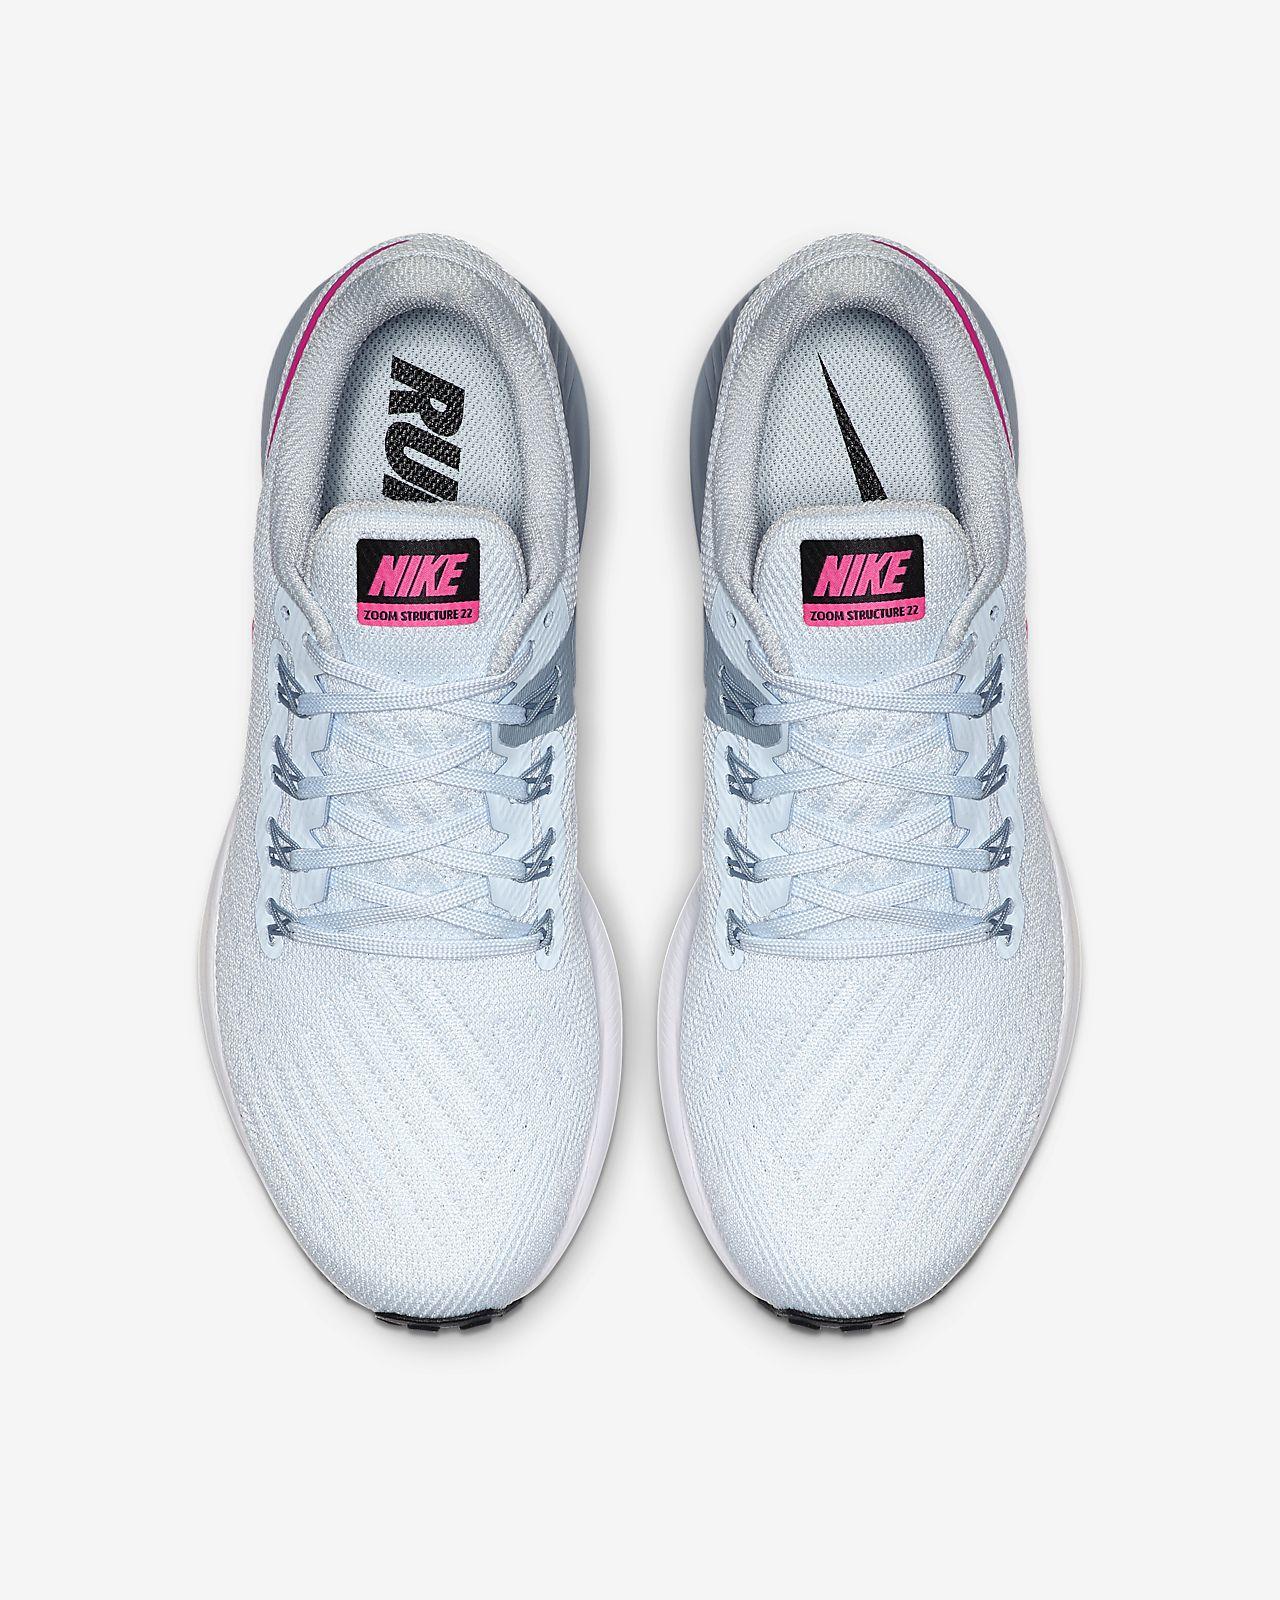 9904249c4ce Nike Air Zoom Structure 22 Women s Running Shoe. Nike.com